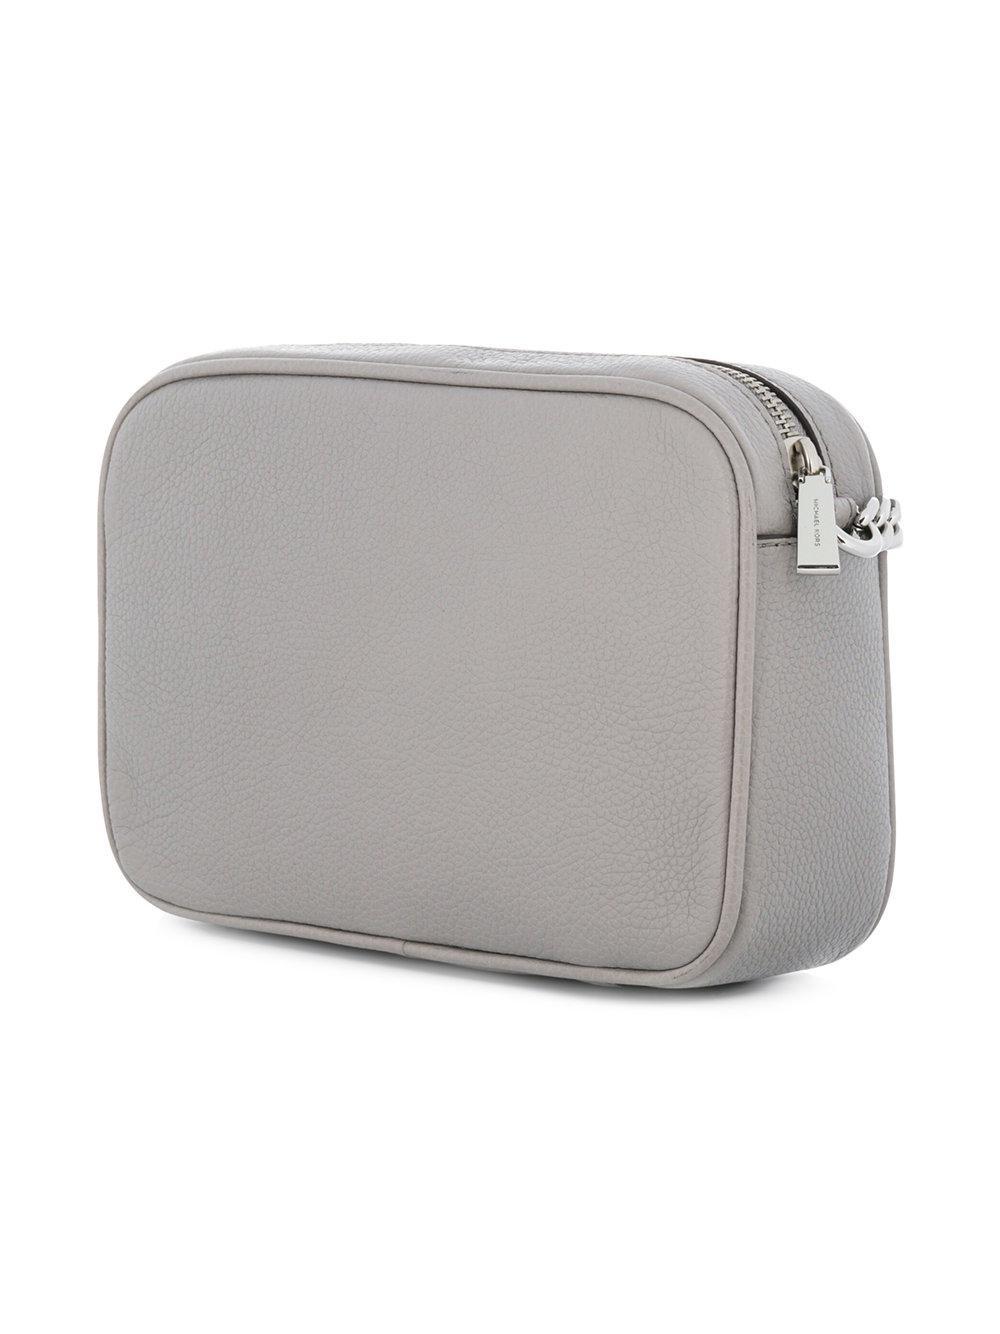 MICHAEL Michael Kors Leather Ginny Medium Crossbody Bag in Grey (Grey)